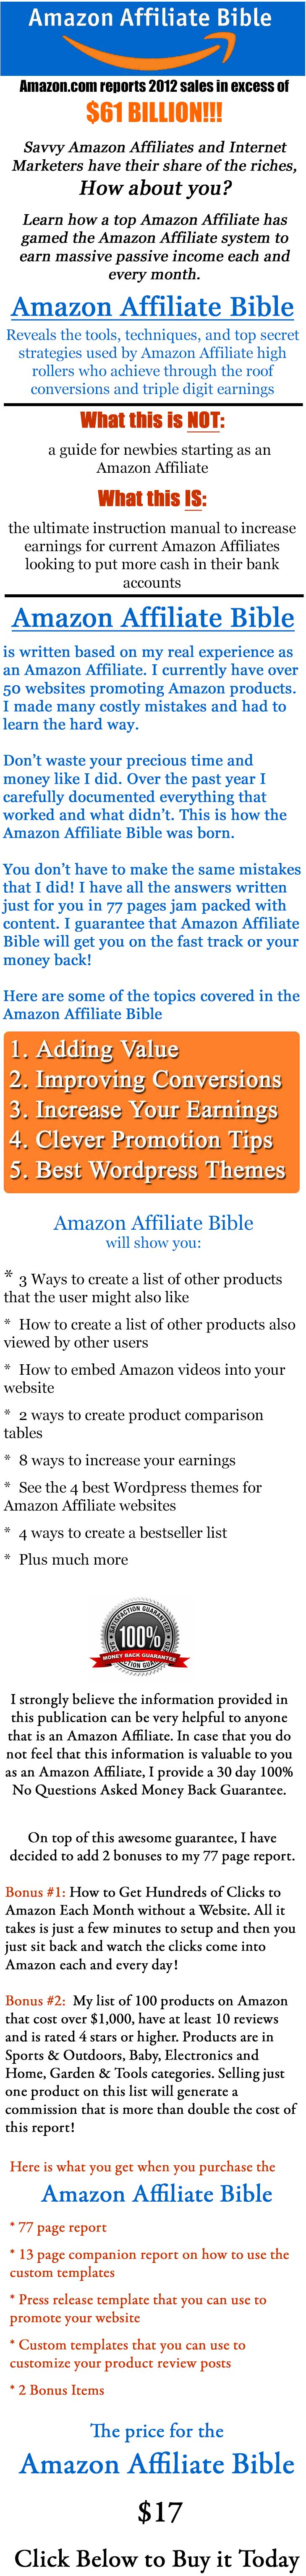 Amazon Affiliate Bible